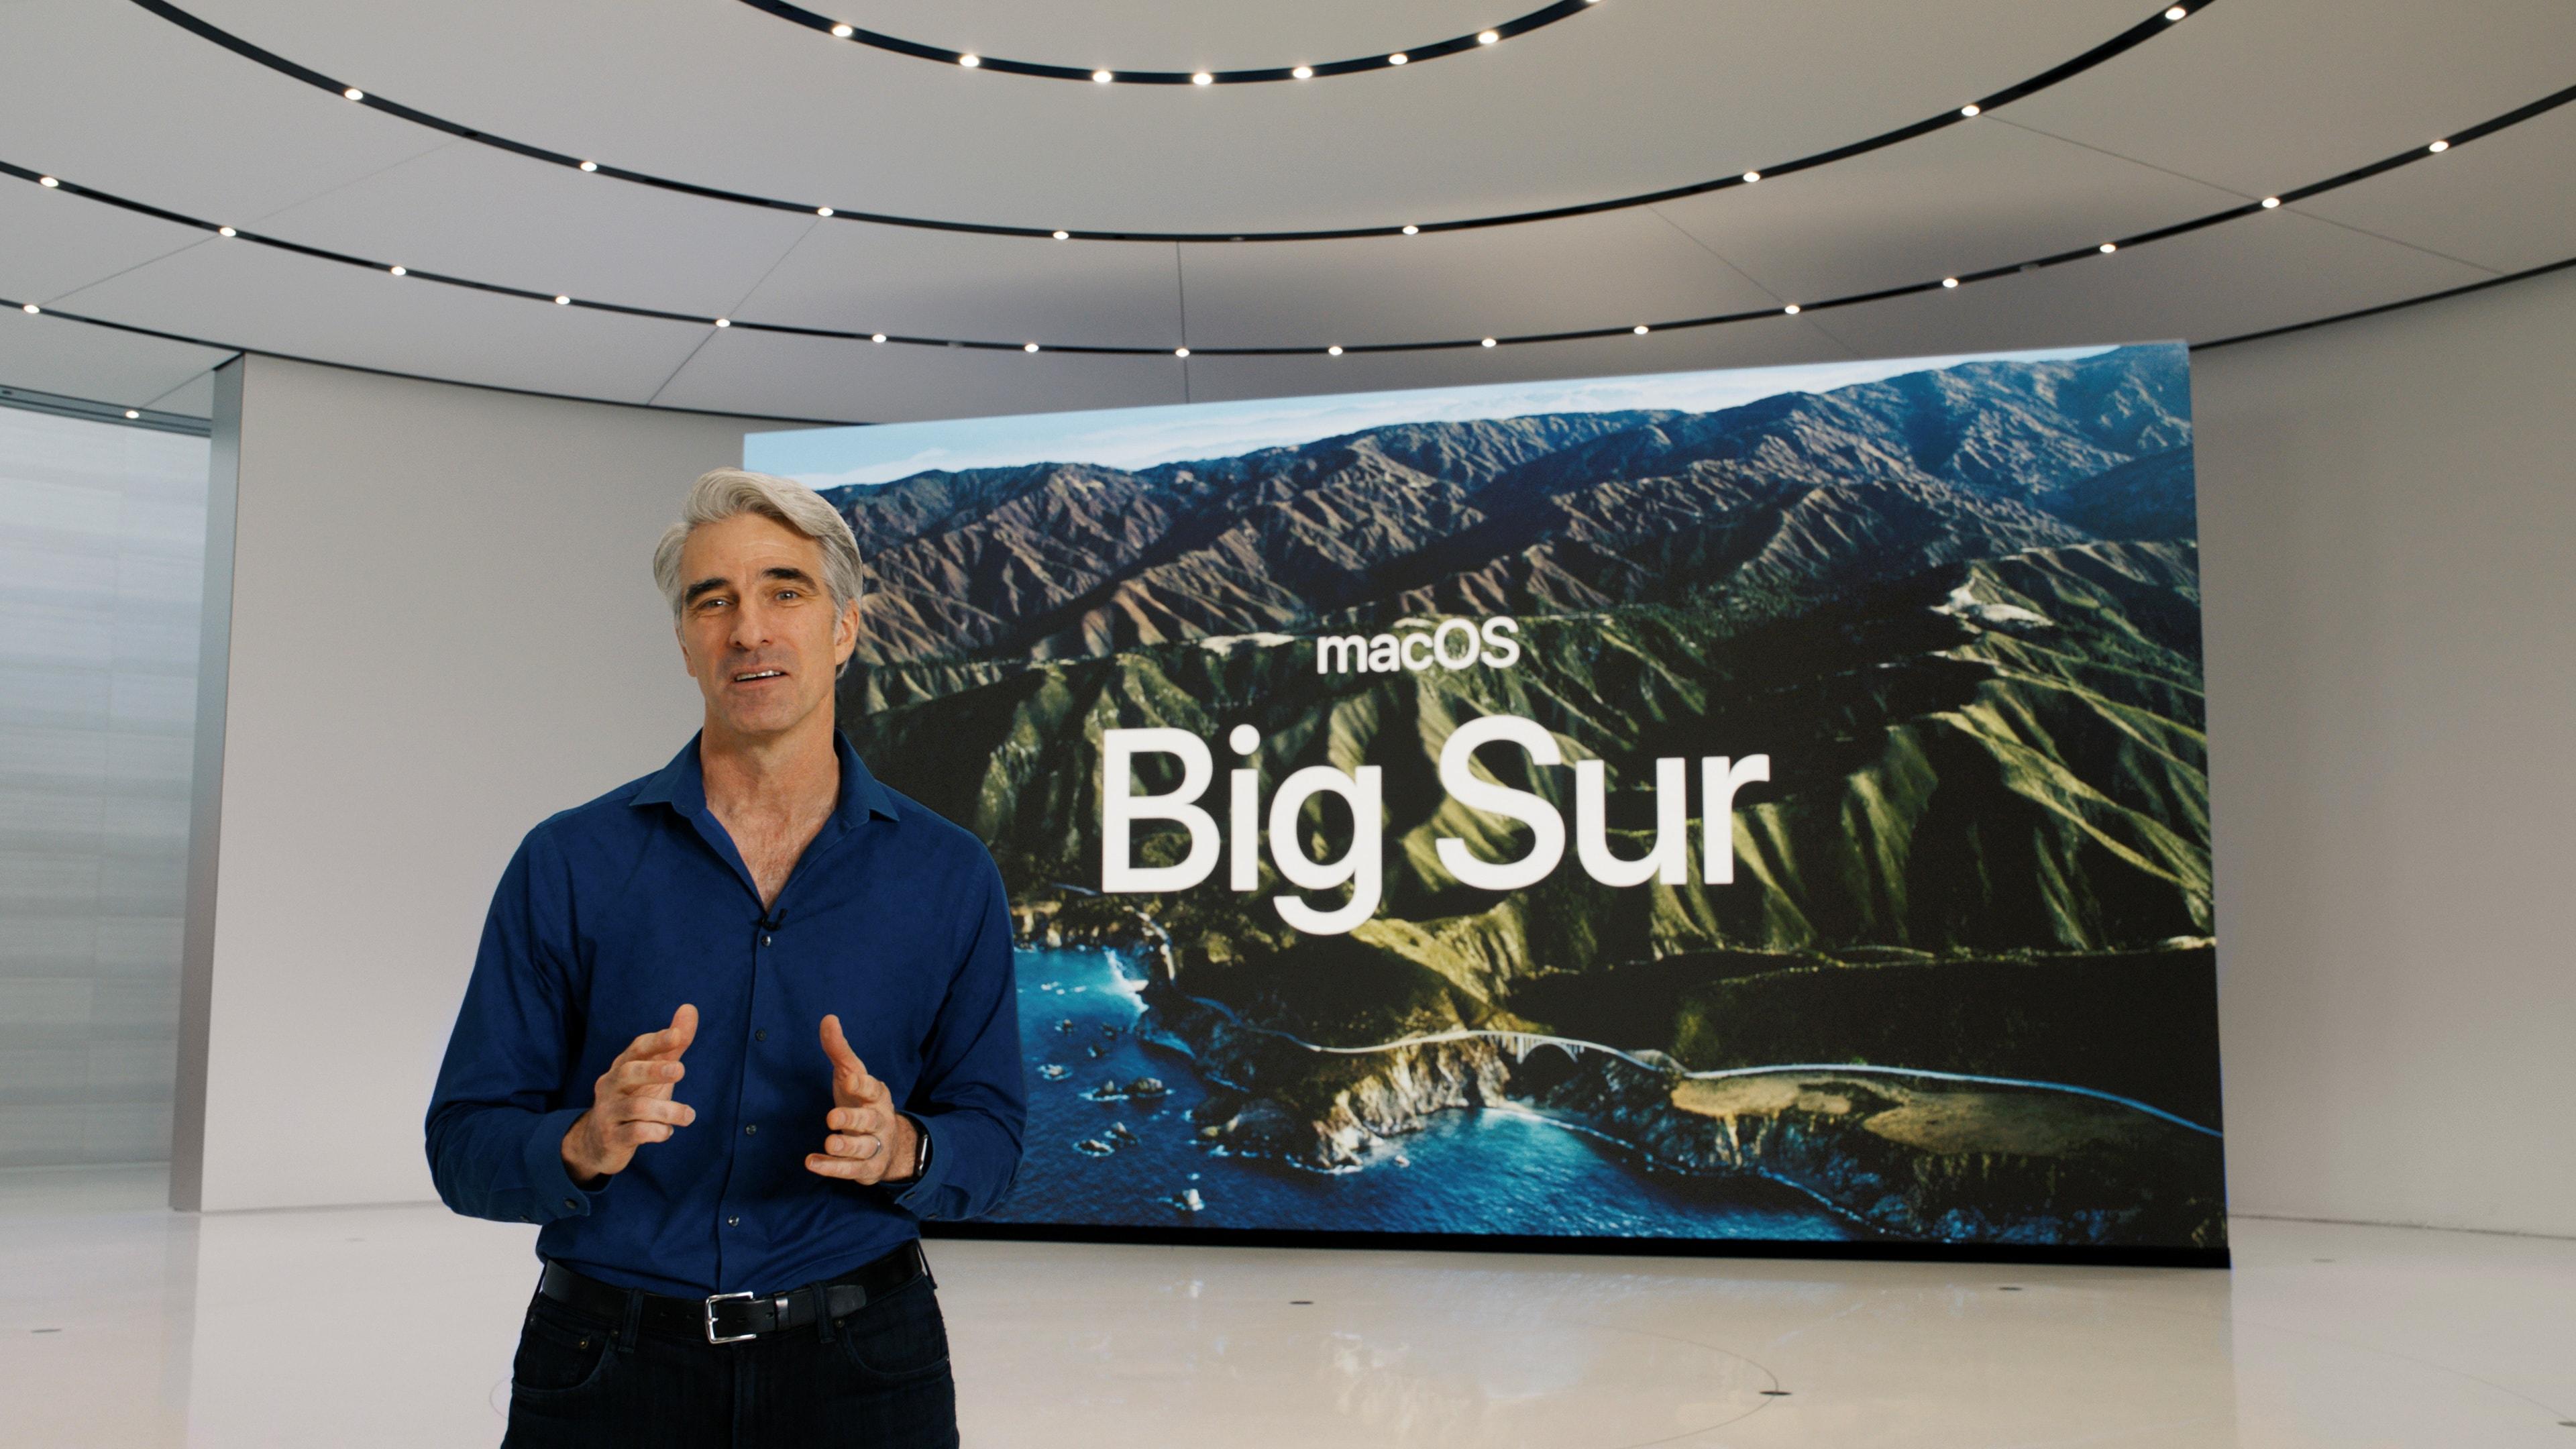 macOS Big Sur-এর ঘোষণা করল অ্যাপেল। একাধিক নয়া ফিচার্স মিলবে। (ছবি সৌজন্য রয়টার্স)